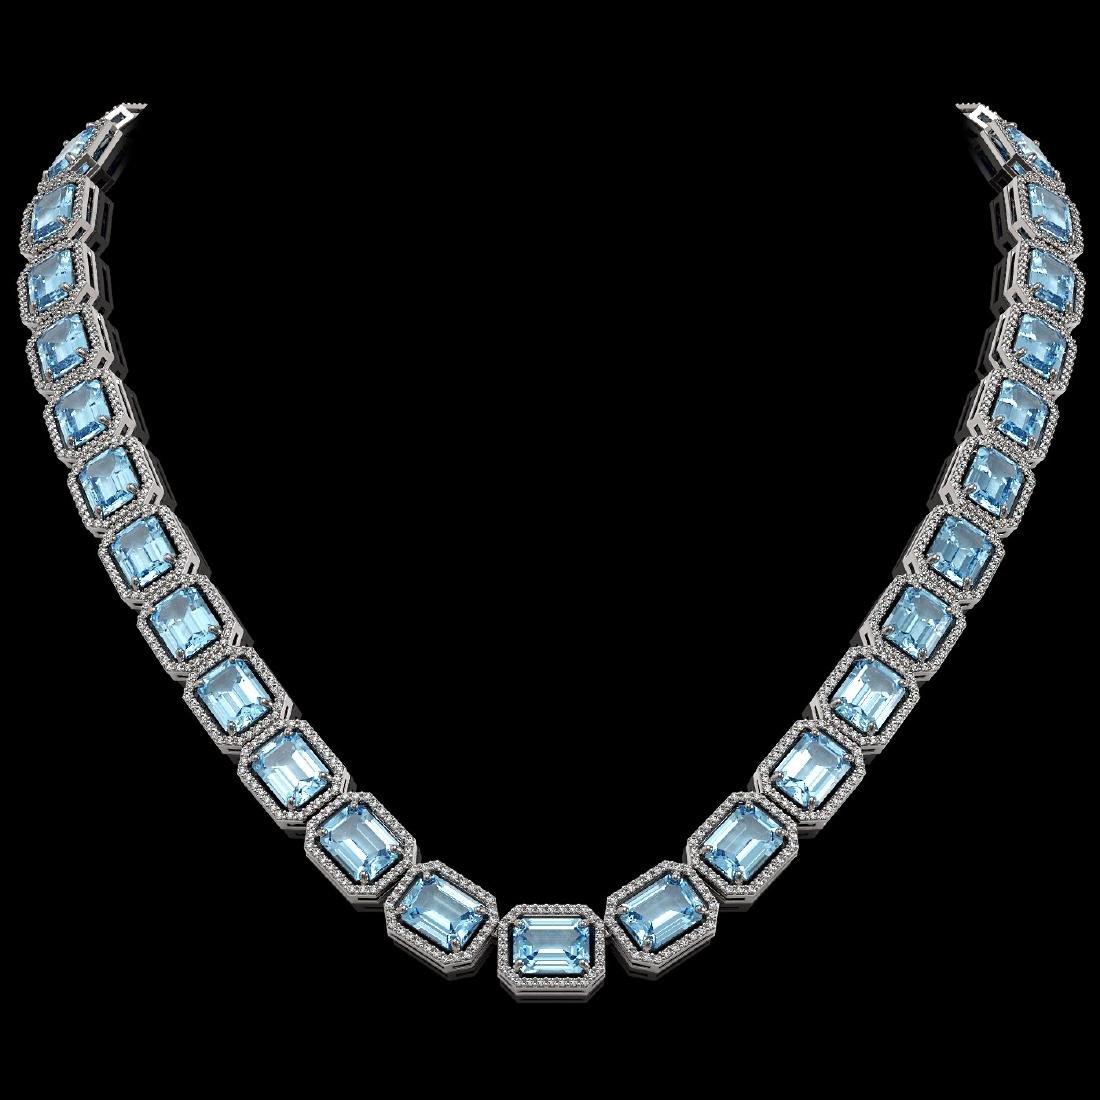 80.98 CTW Aquamarine & Diamond Halo Necklace 10K White